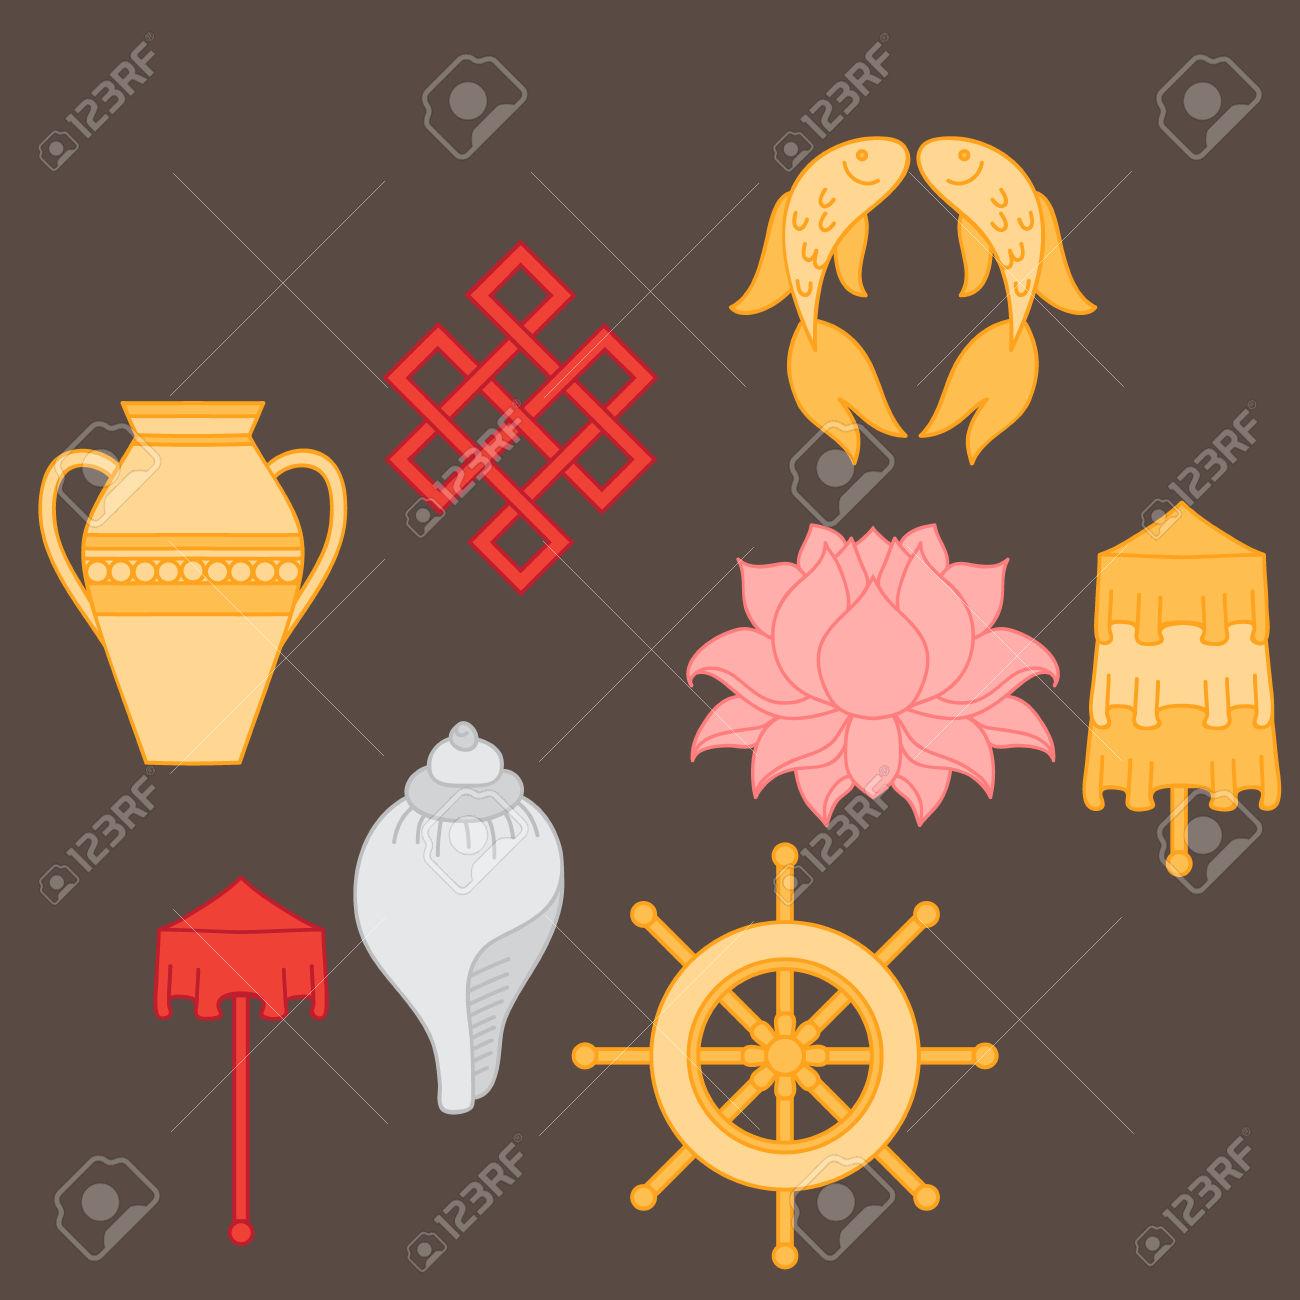 Buddhist Symbolism, The 8 Auspicious Symbols Of Buddhism, Right.